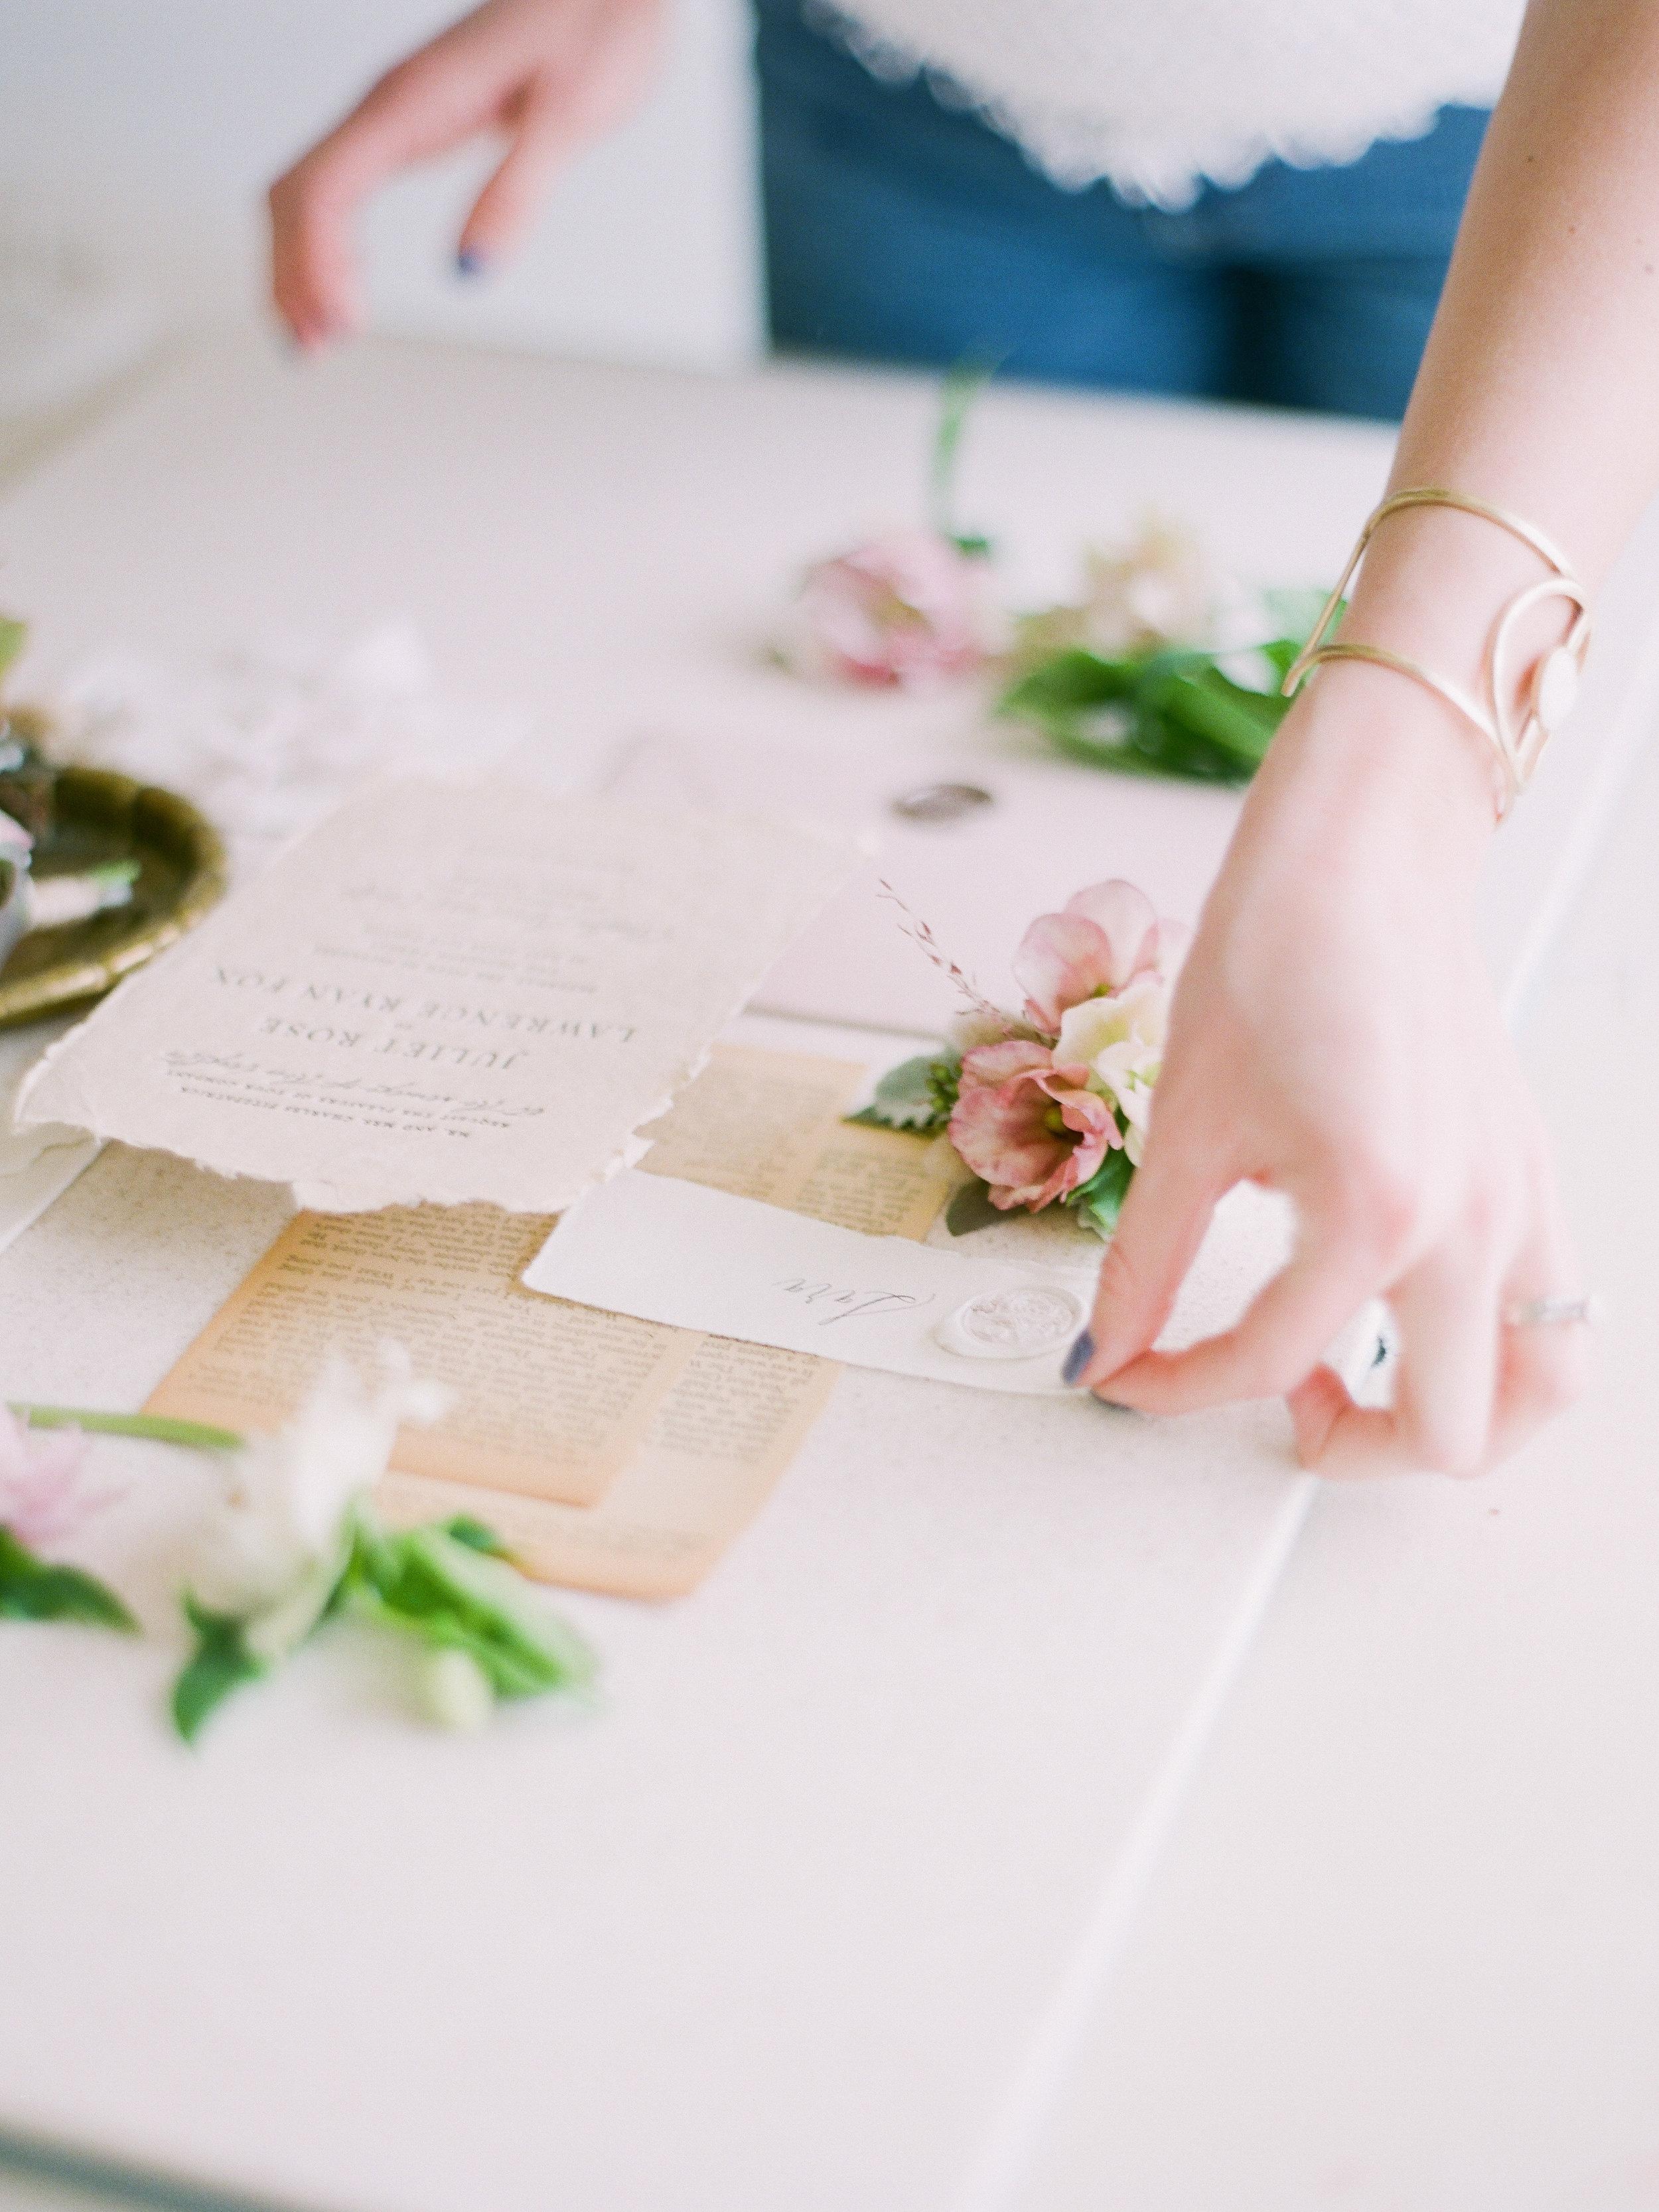 Dani-Cowan-Photography-Colorado-Wedding-Film-Photographer-Natural-Light92.JPG